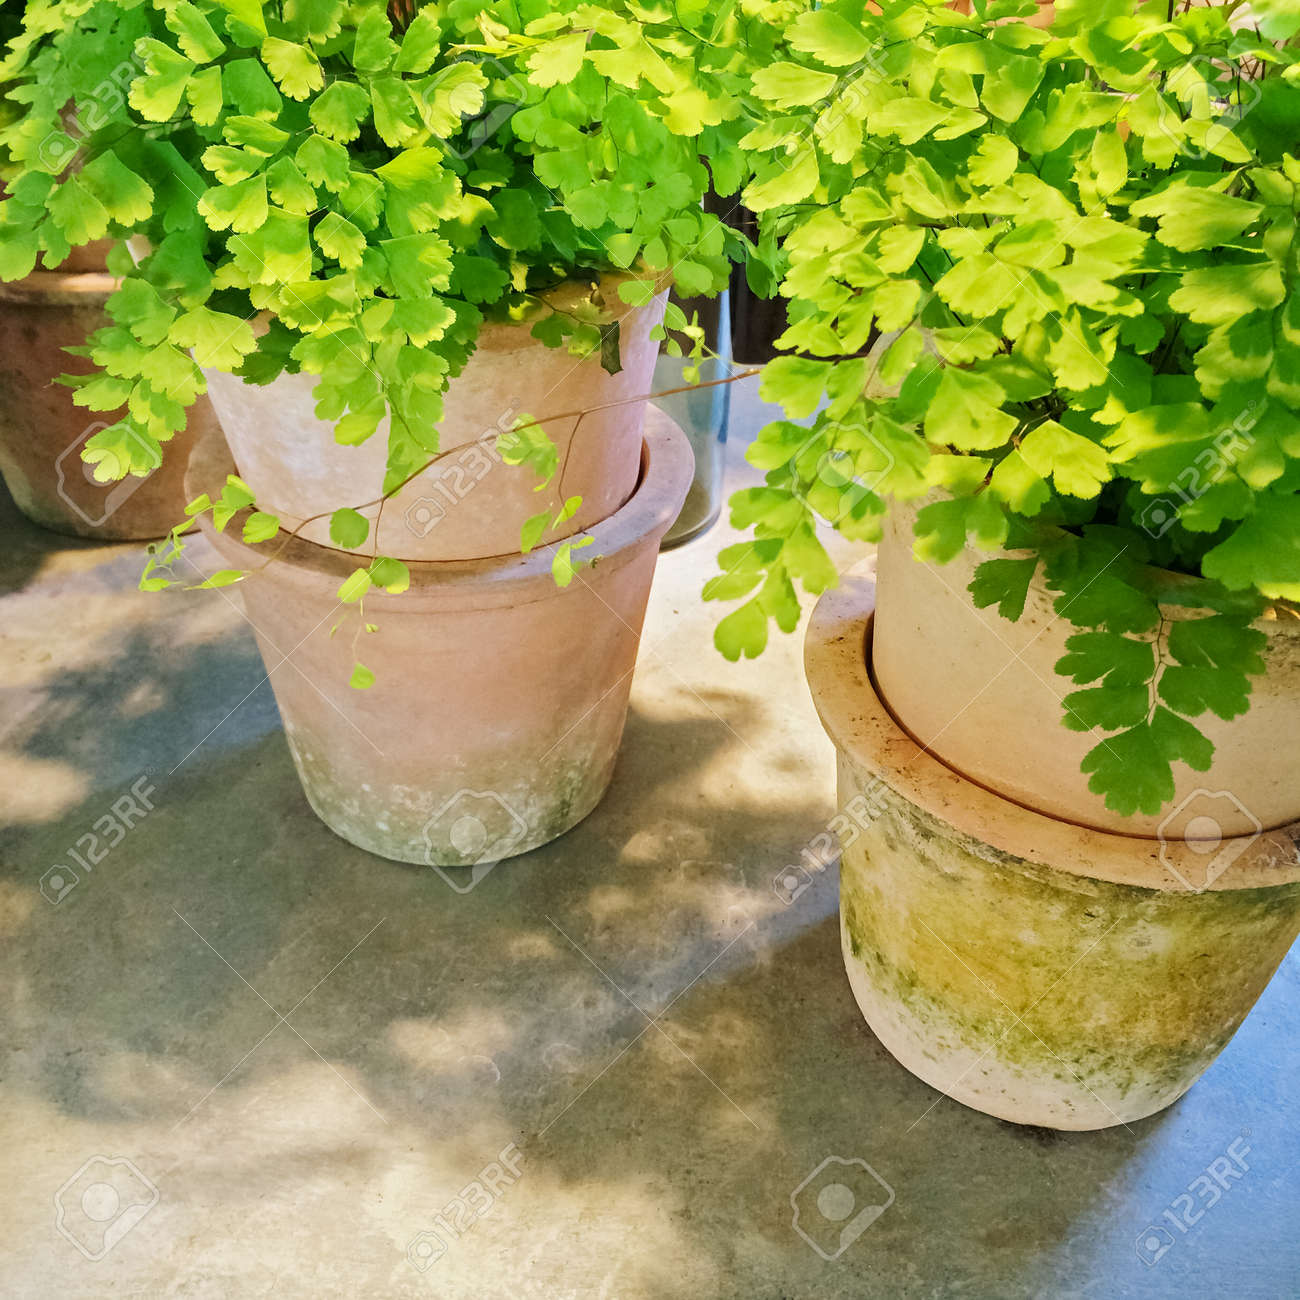 Green Plants In Clay Pots, Under Sunlight. Garden Decor. Stock Photo ...